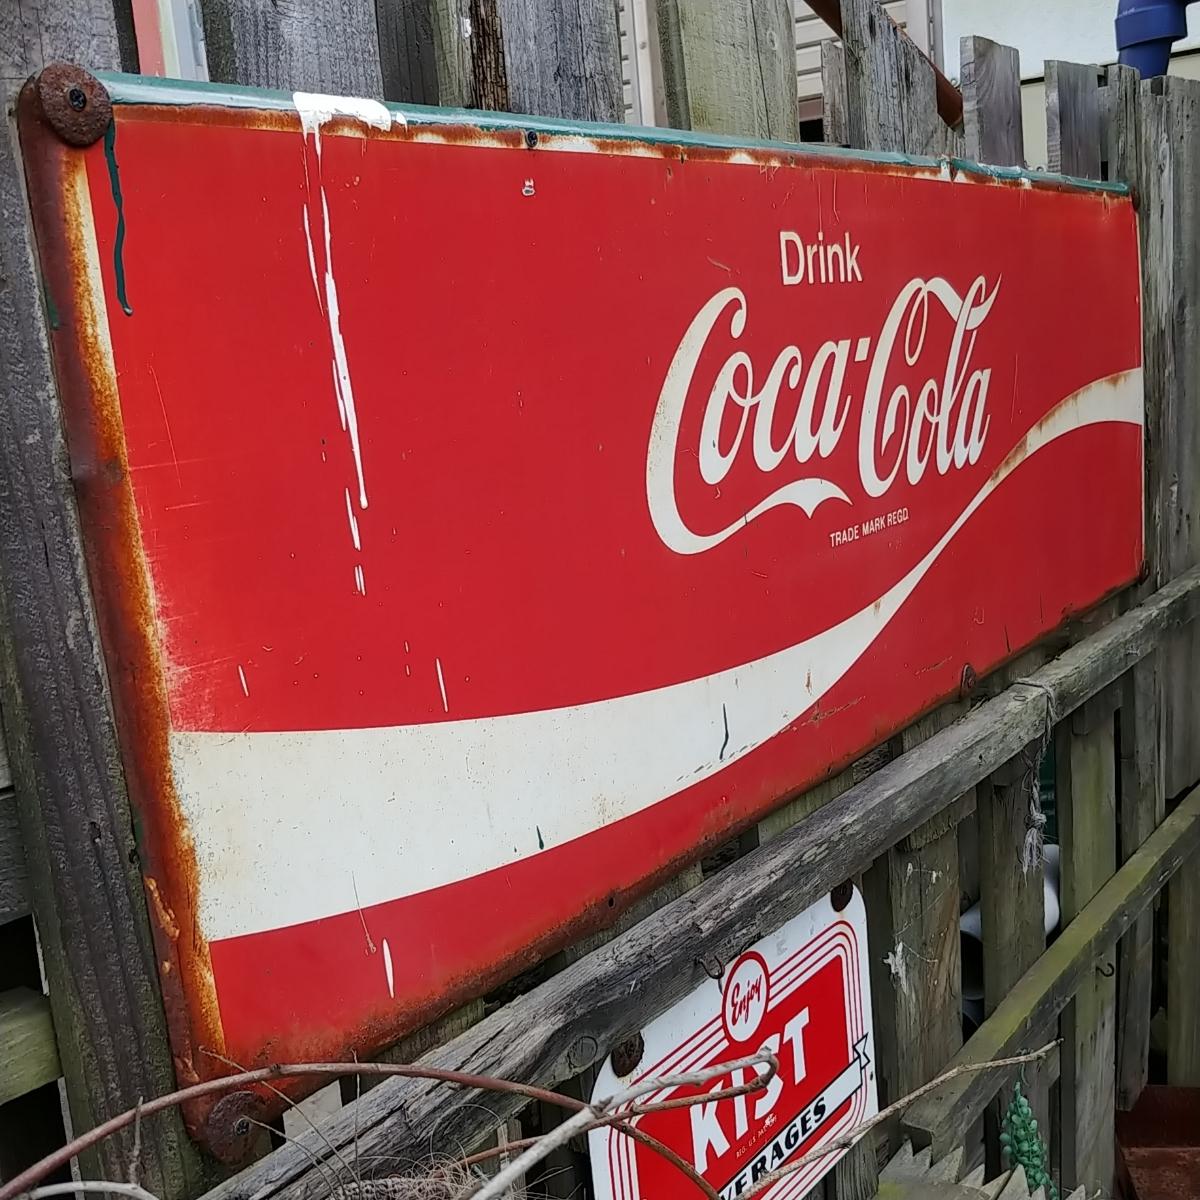 ☆AMERICAN VINTAGE SING☆Coca-Cola (コカ・コーラ)大型 フロント看板(非売品)#店舗什器#世田谷ベース #ガレージライフ_画像3